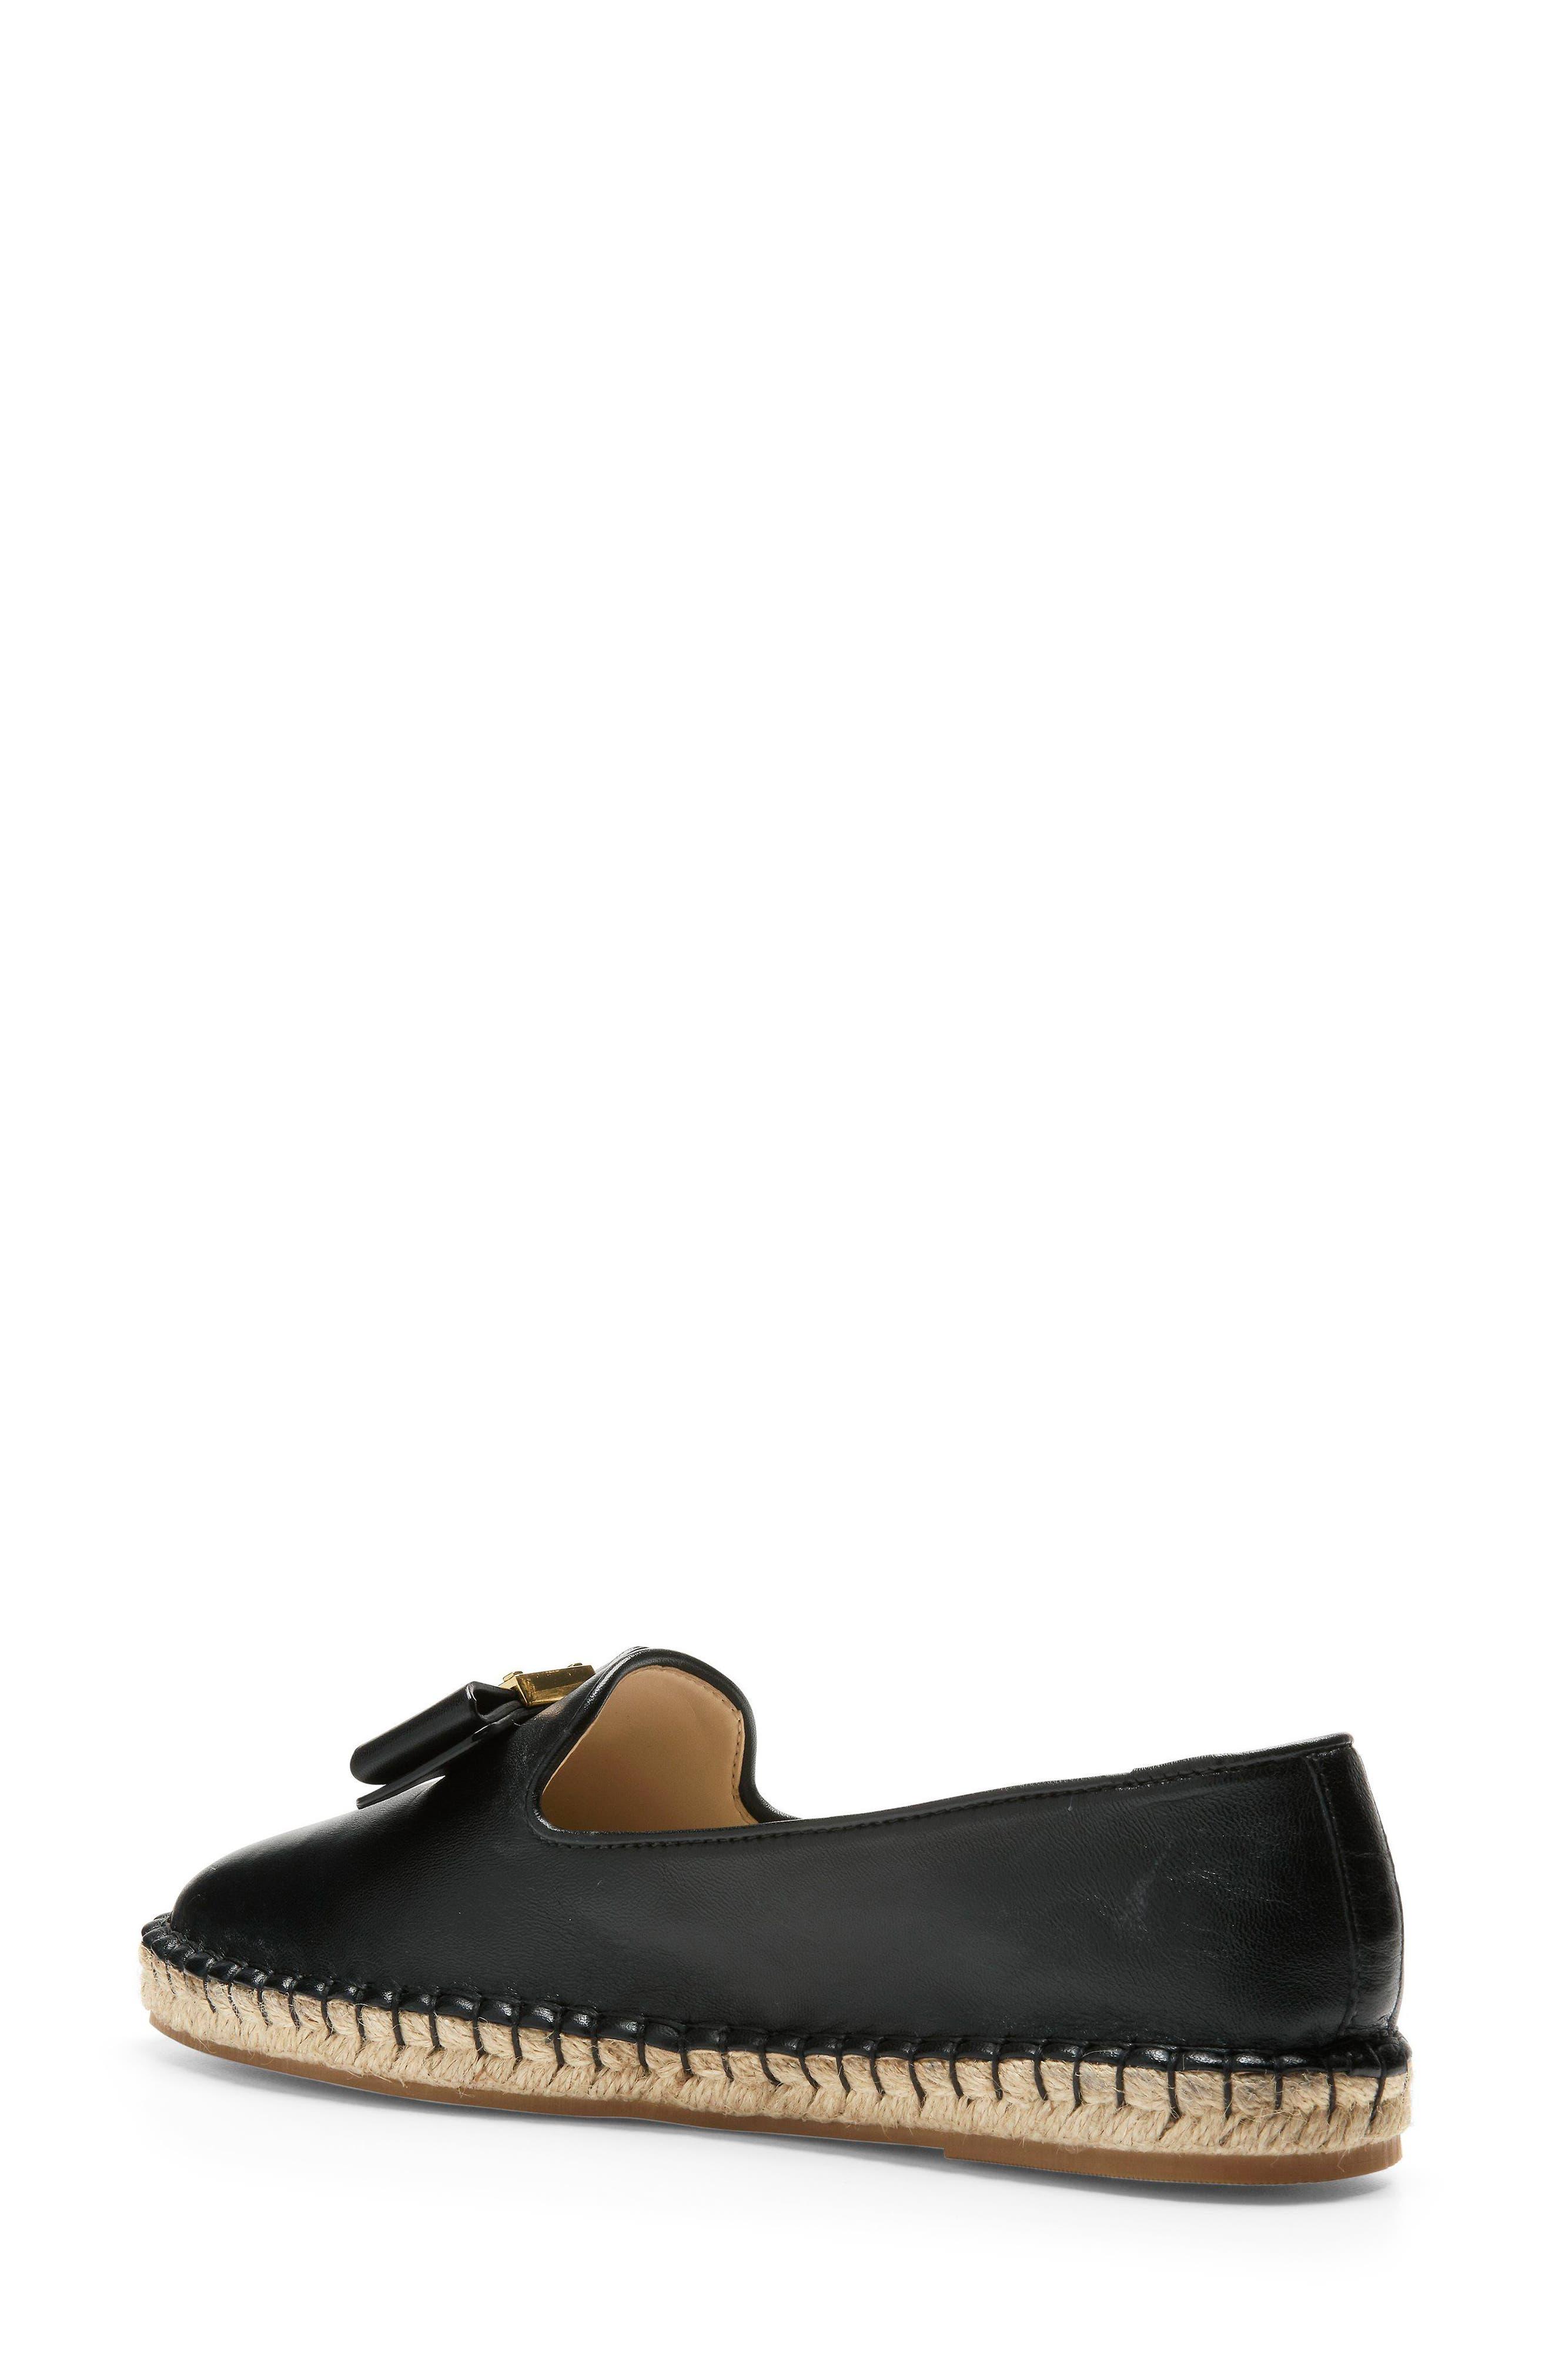 Tali Bow Espadrille Flat,                             Alternate thumbnail 2, color,                             Black Leather